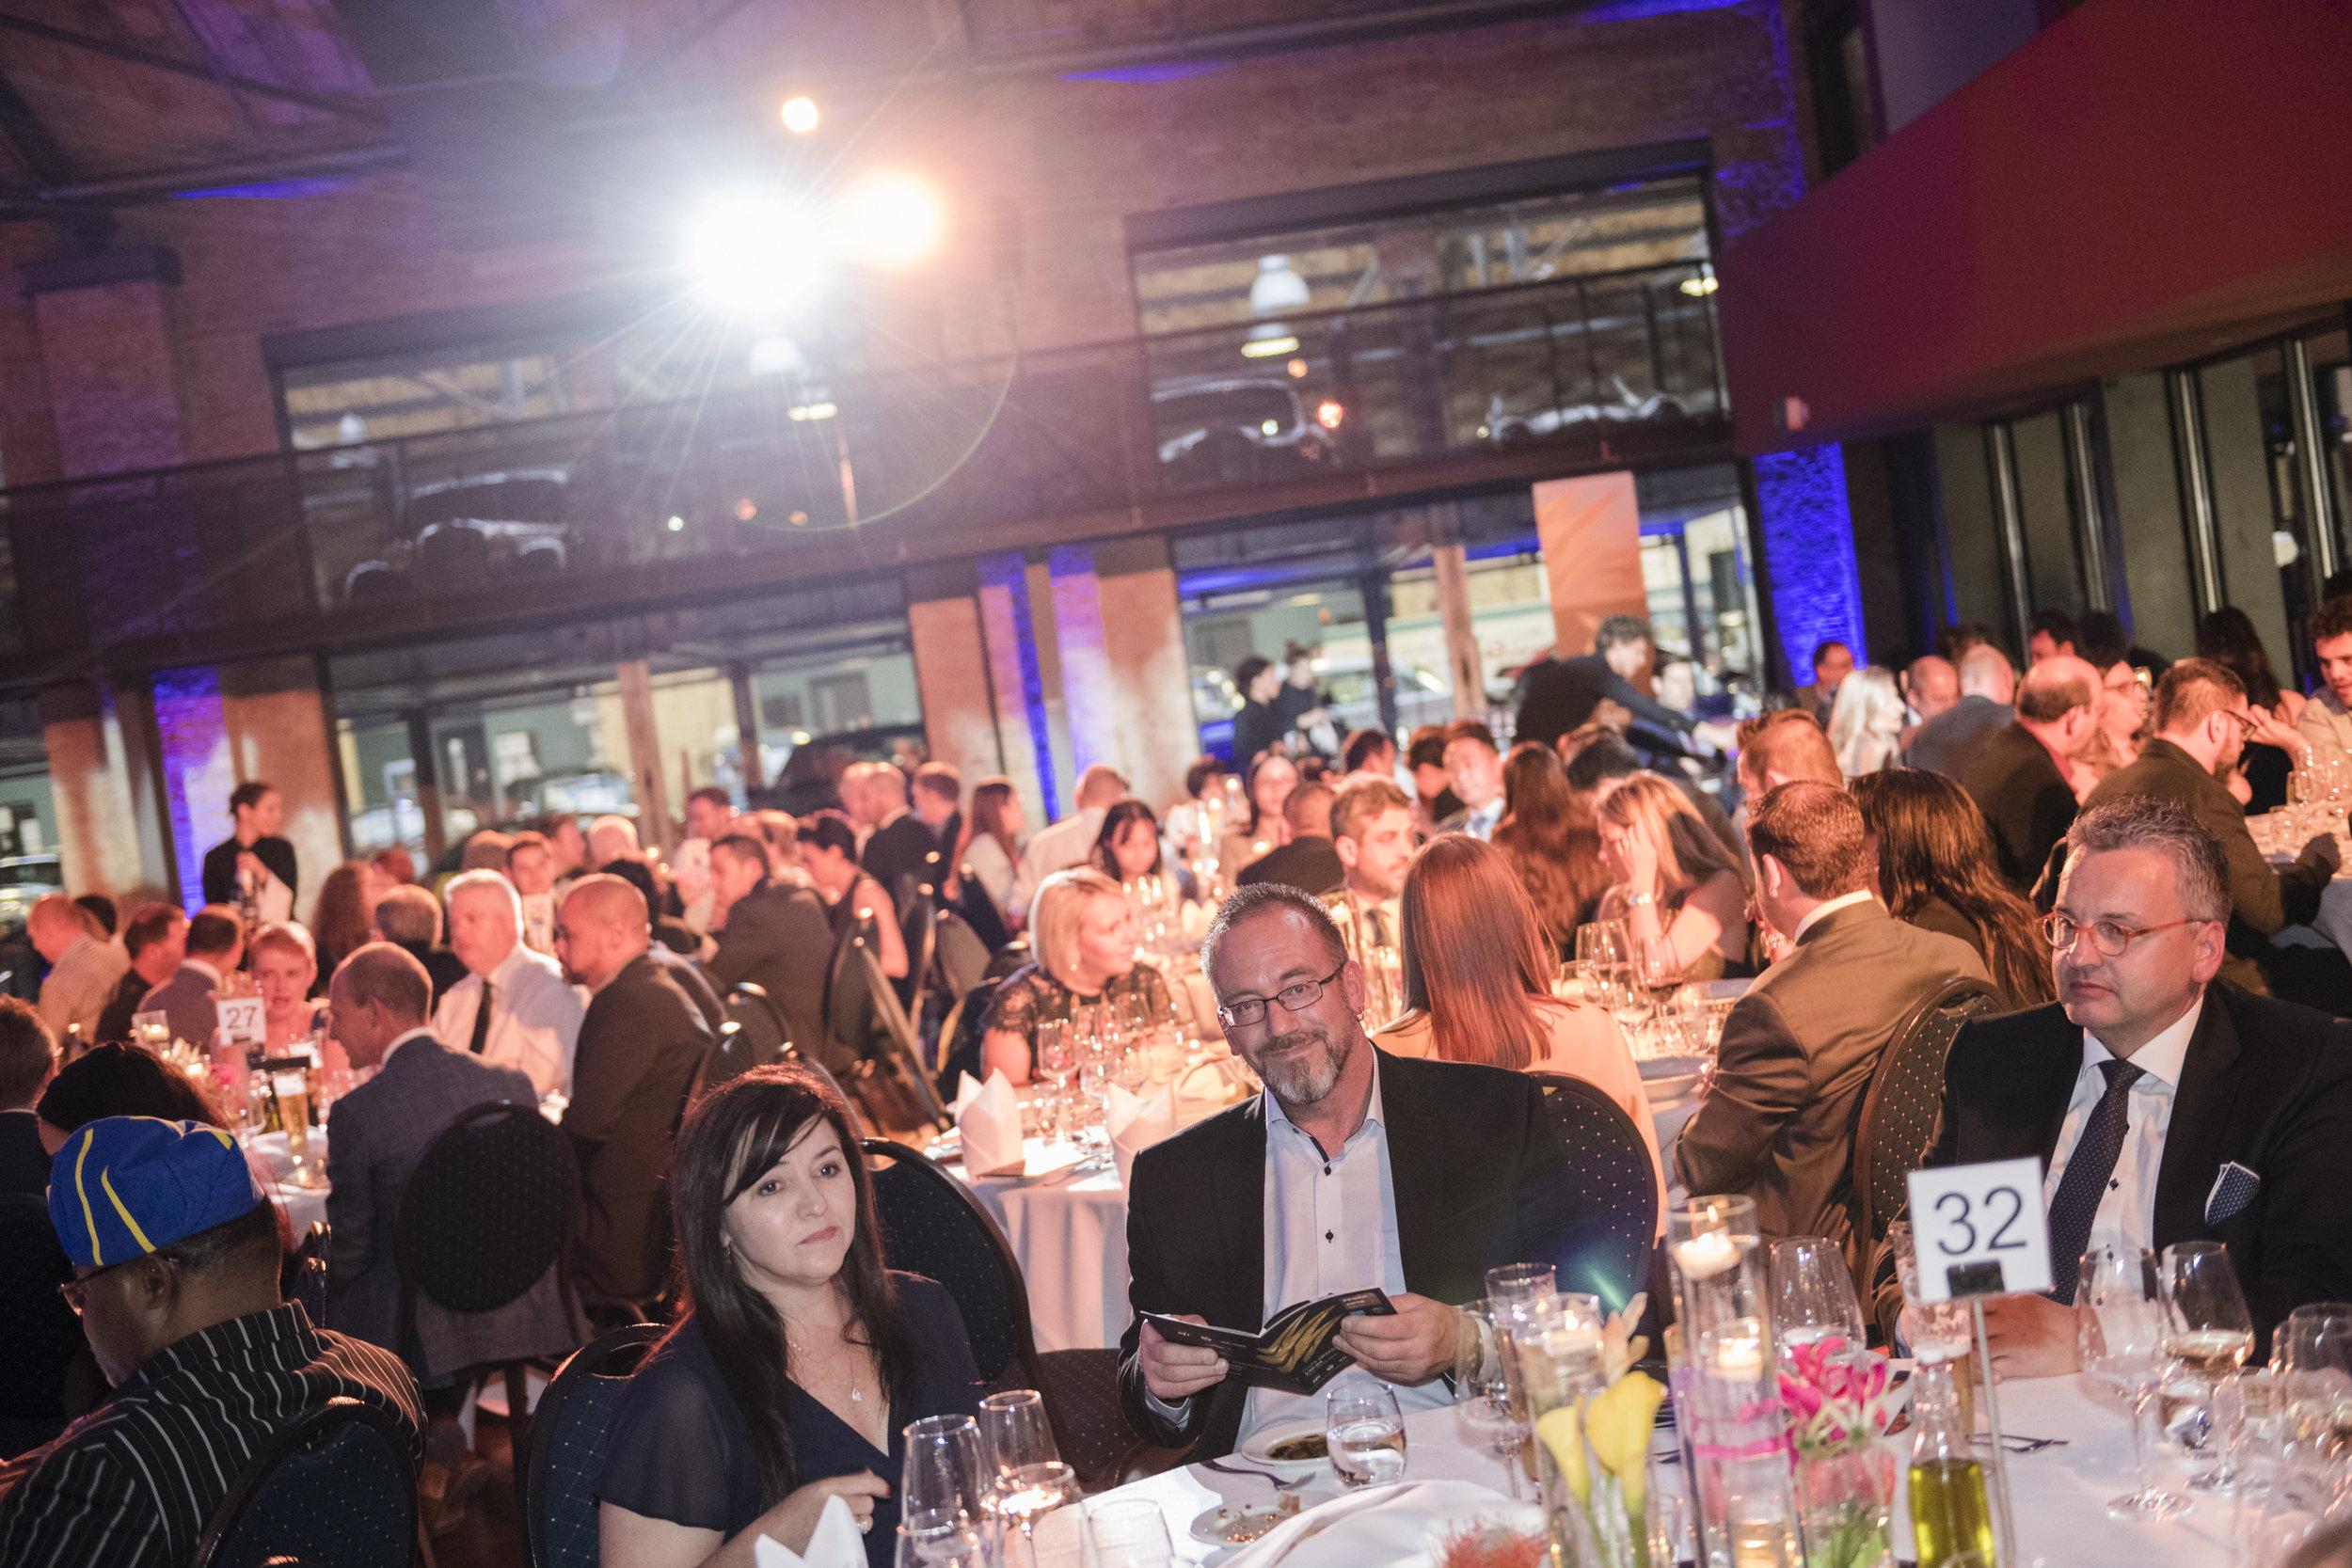 2018-05-16_FESPA_Awards_0108.jpg